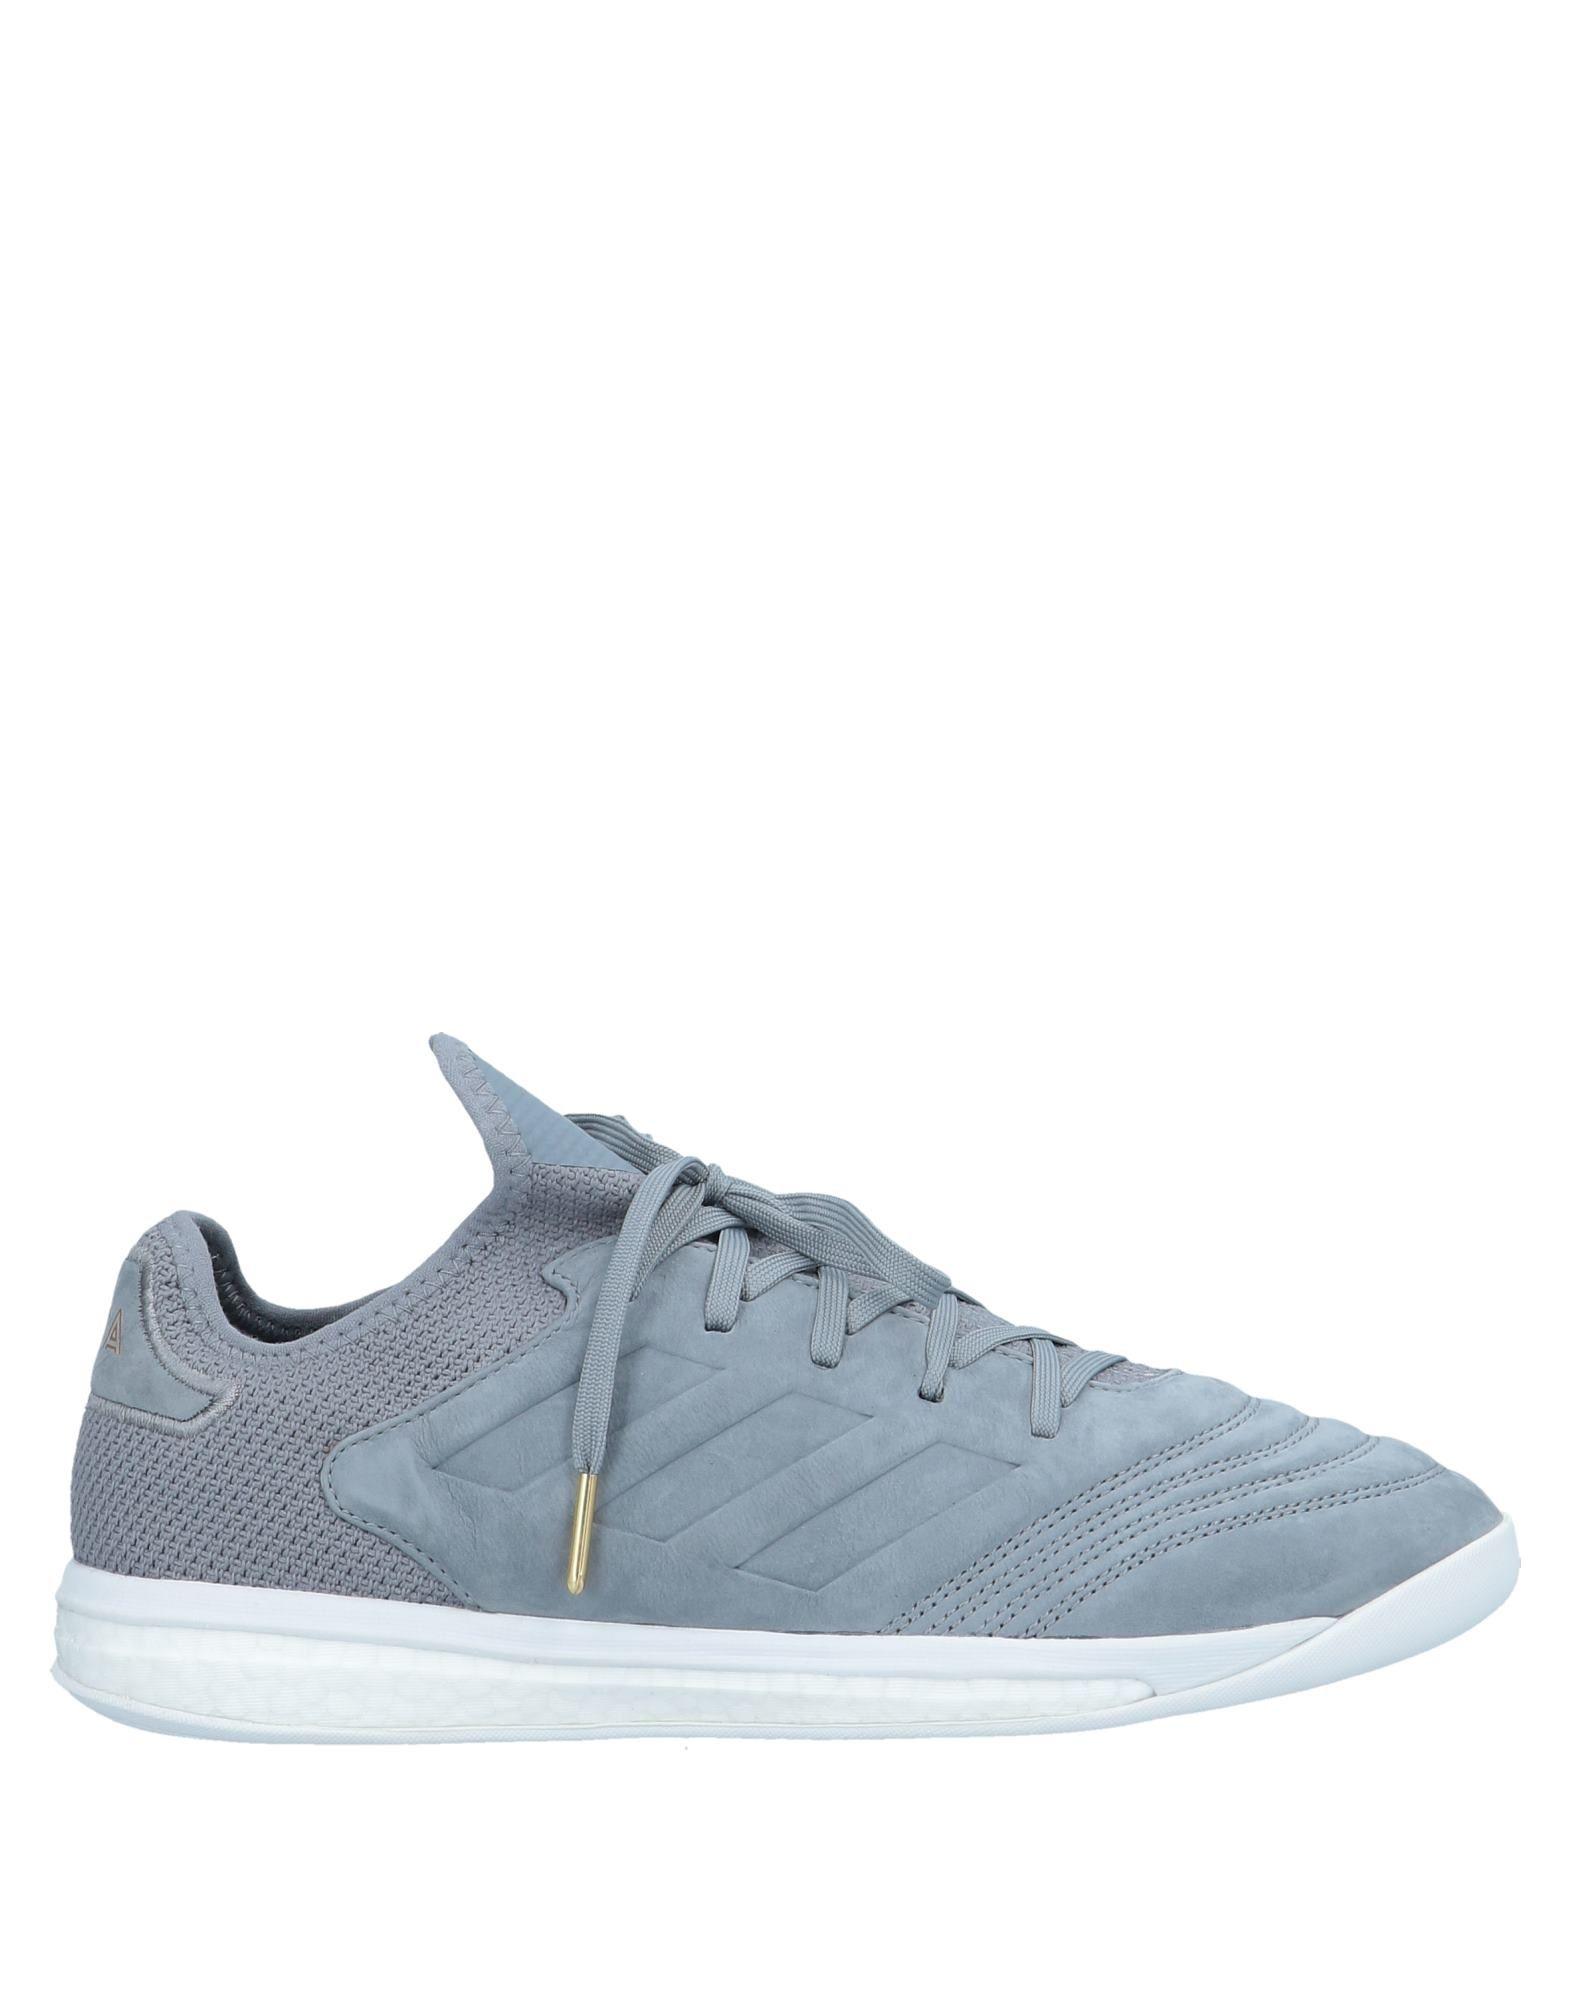 ADIDAS Herren Low Sneakers & Tennisschuhe12 grau